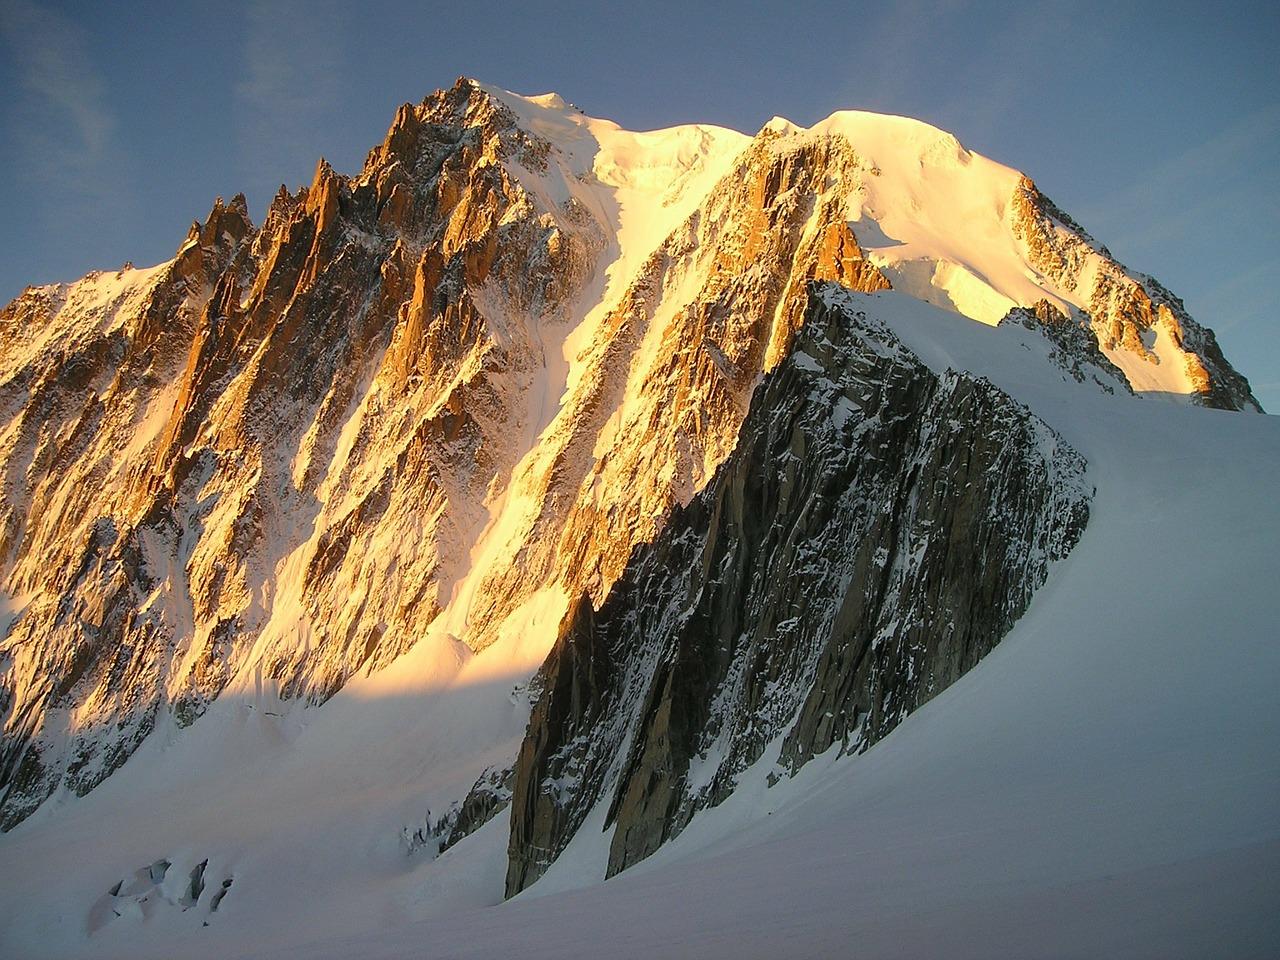 Chamonix - Europe Winter Destinatiosn